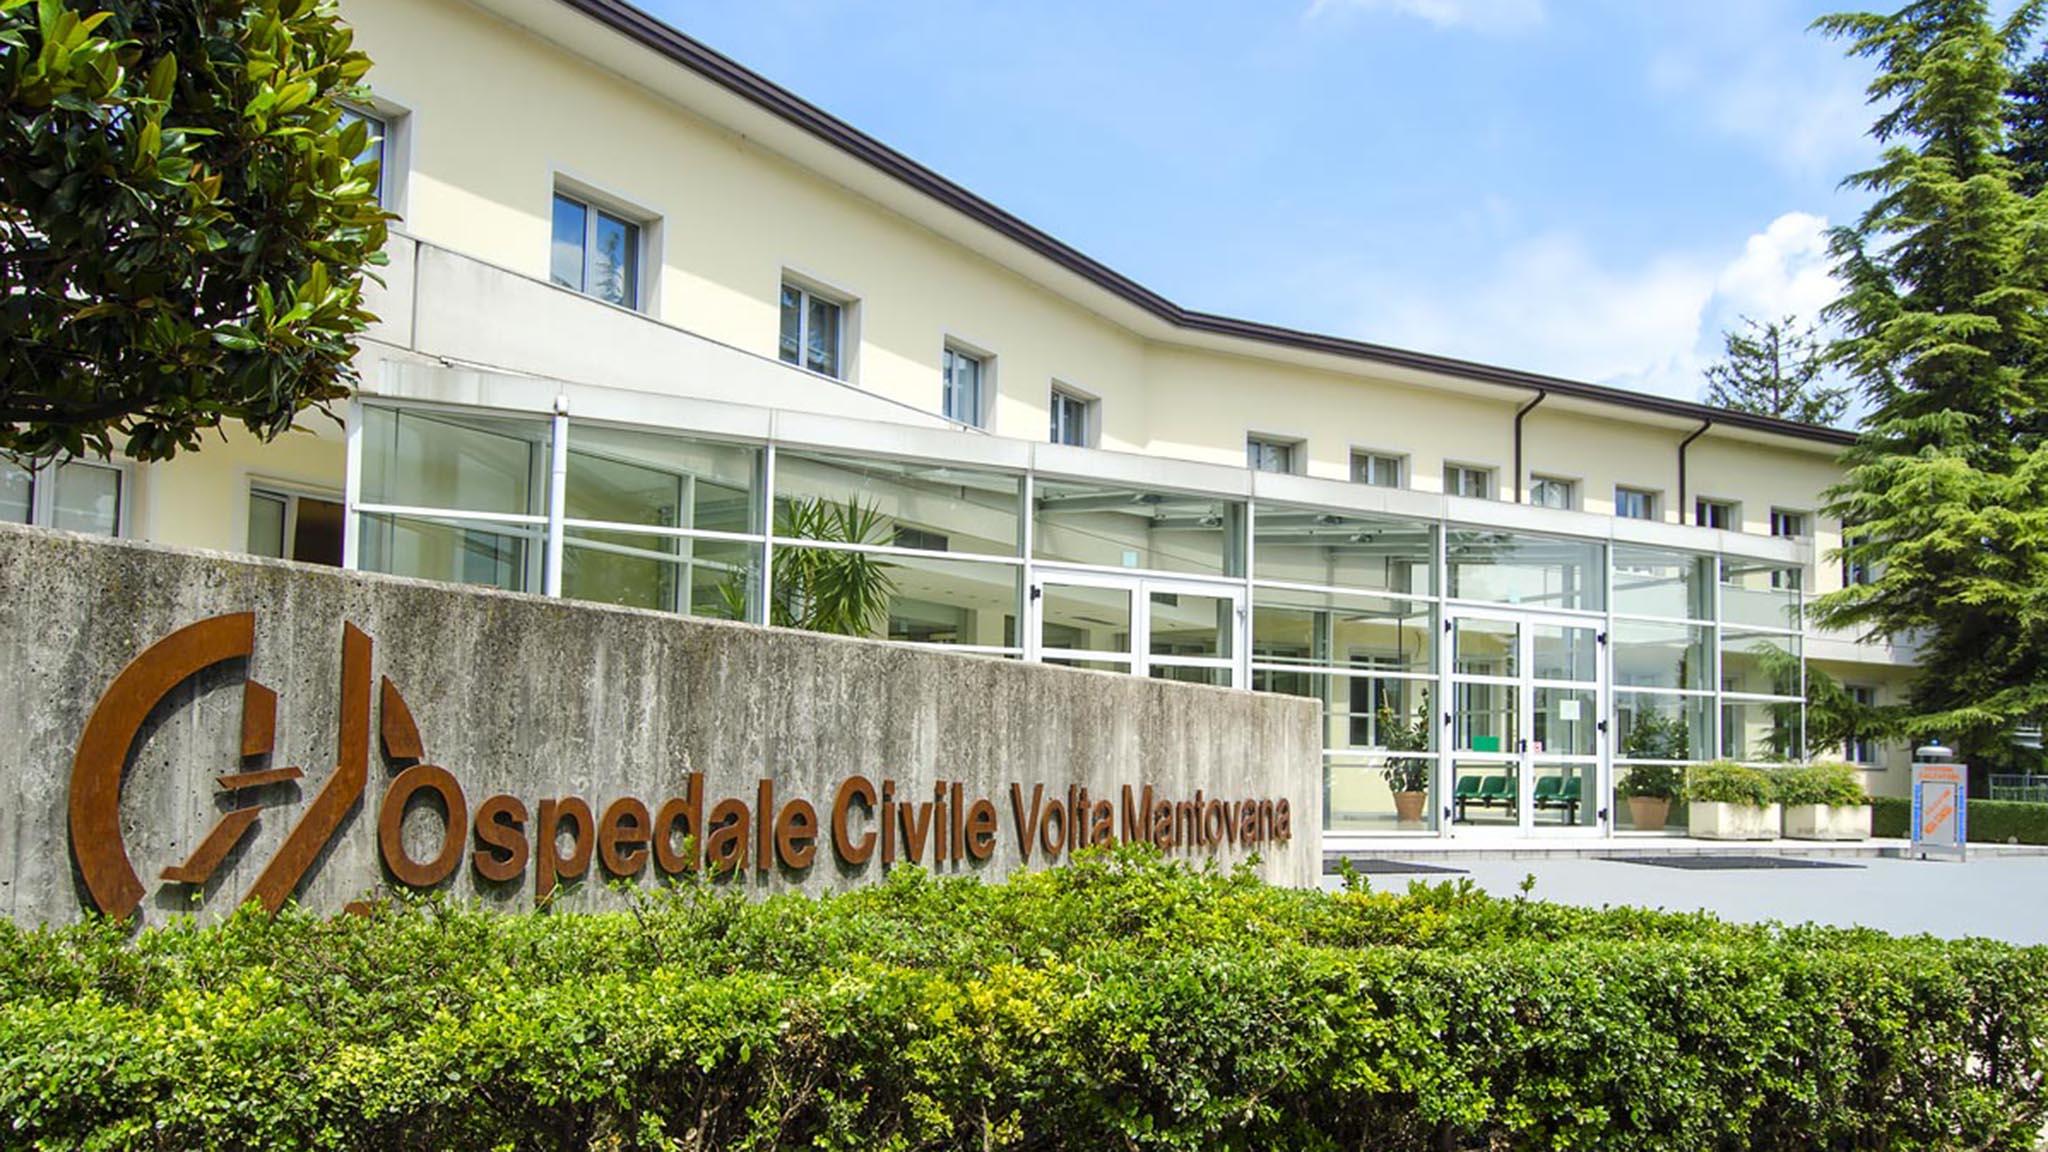 Ospedale civile Voltamantovana